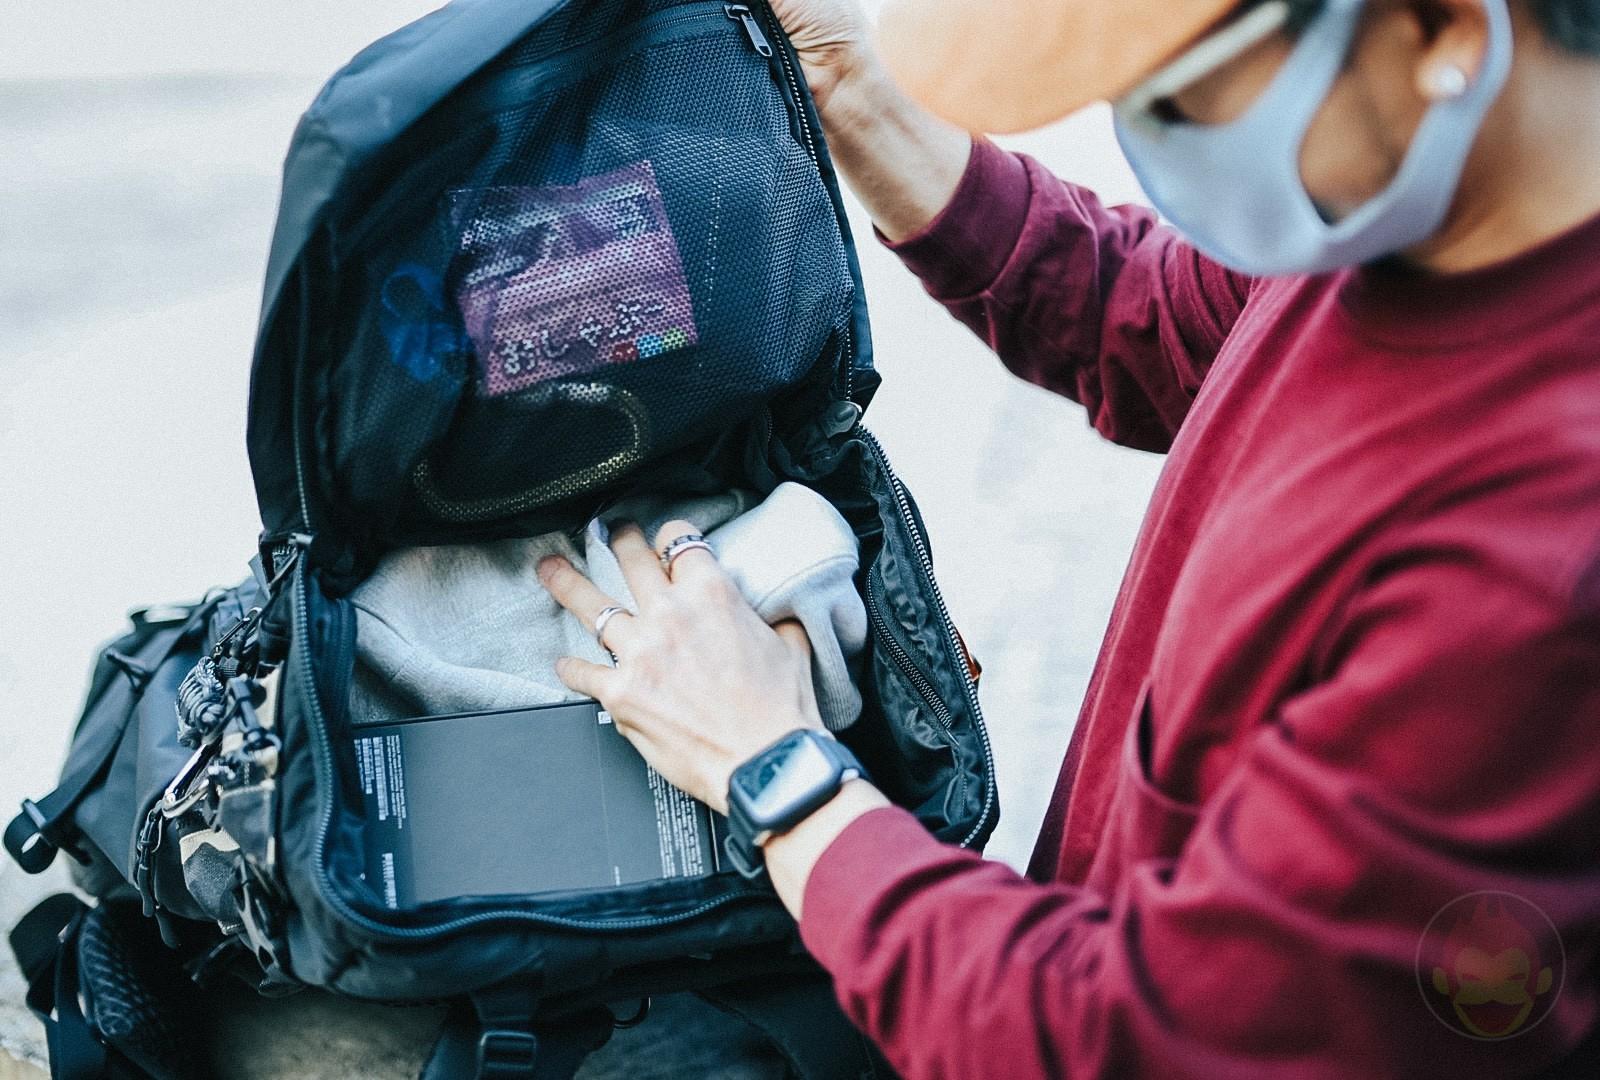 WANDRD FERNWEH Backpack Review 18